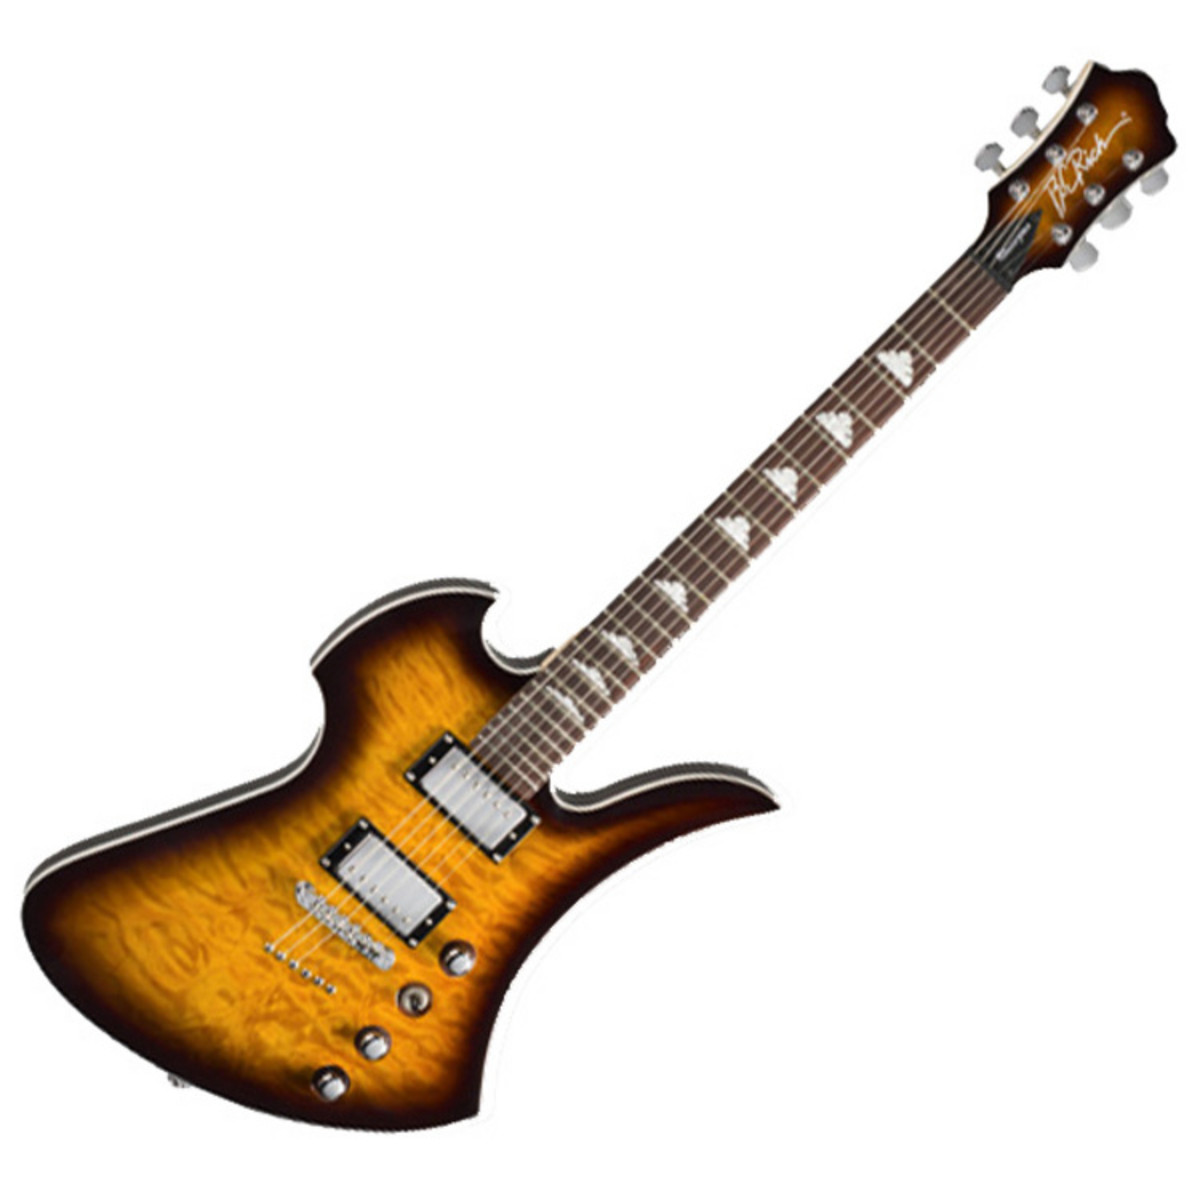 disc bc rich mockingbird masterpiece electric guitar tobacco at gear4music. Black Bedroom Furniture Sets. Home Design Ideas